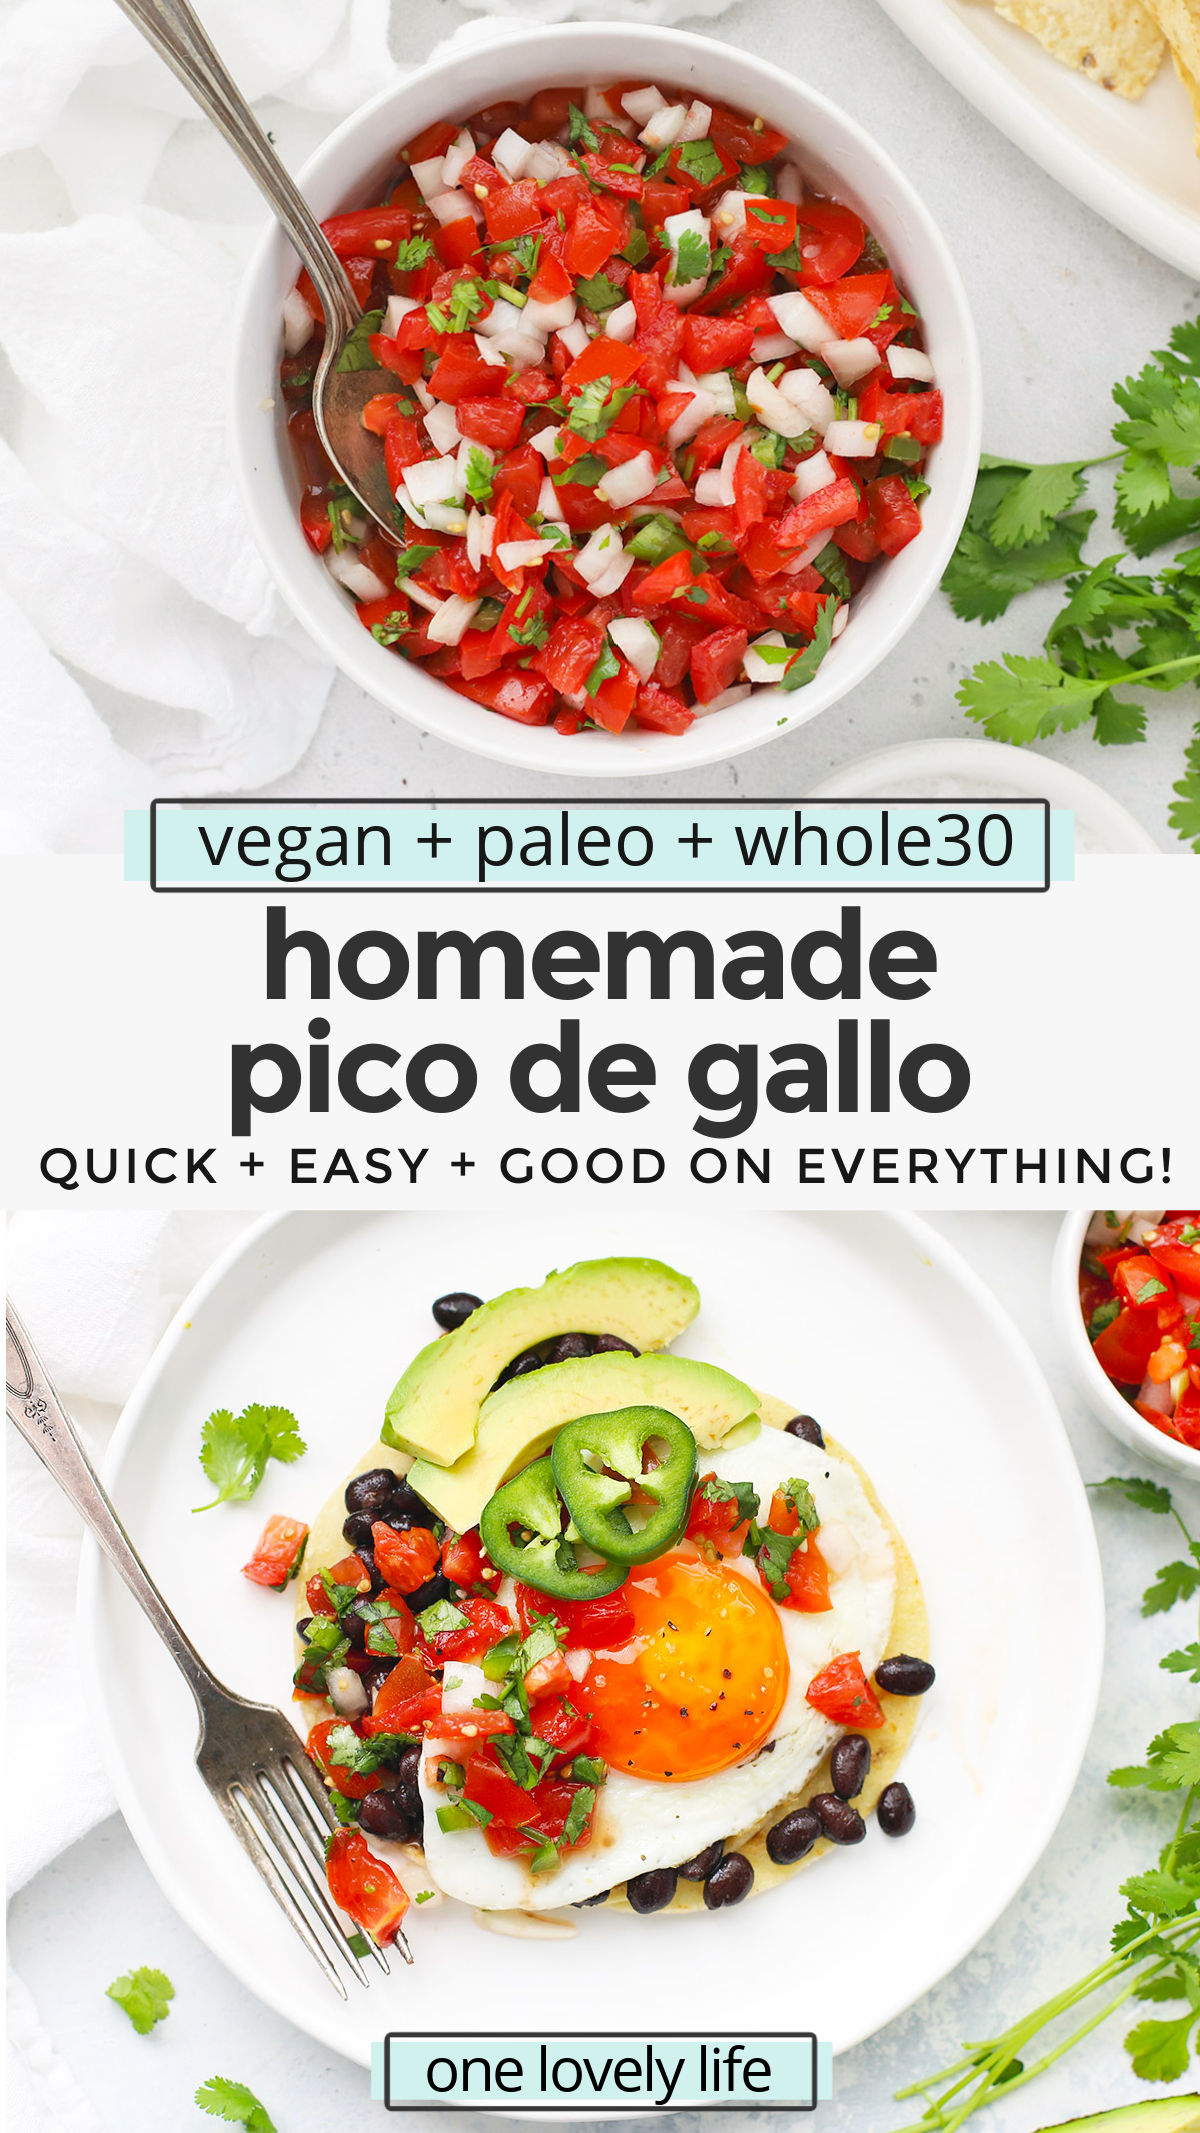 How to Make Pico de Gallo - You'll LOVE this fresh salsa recipe! It's perfect on tacos, burritos, quesadillas, nachos, and more! // Fresh Salsa Recipe // Authentic Pico de Gallo // Homemade Salsa // pico de gallo recipe #salsa #picodegallo #texmex #mexican